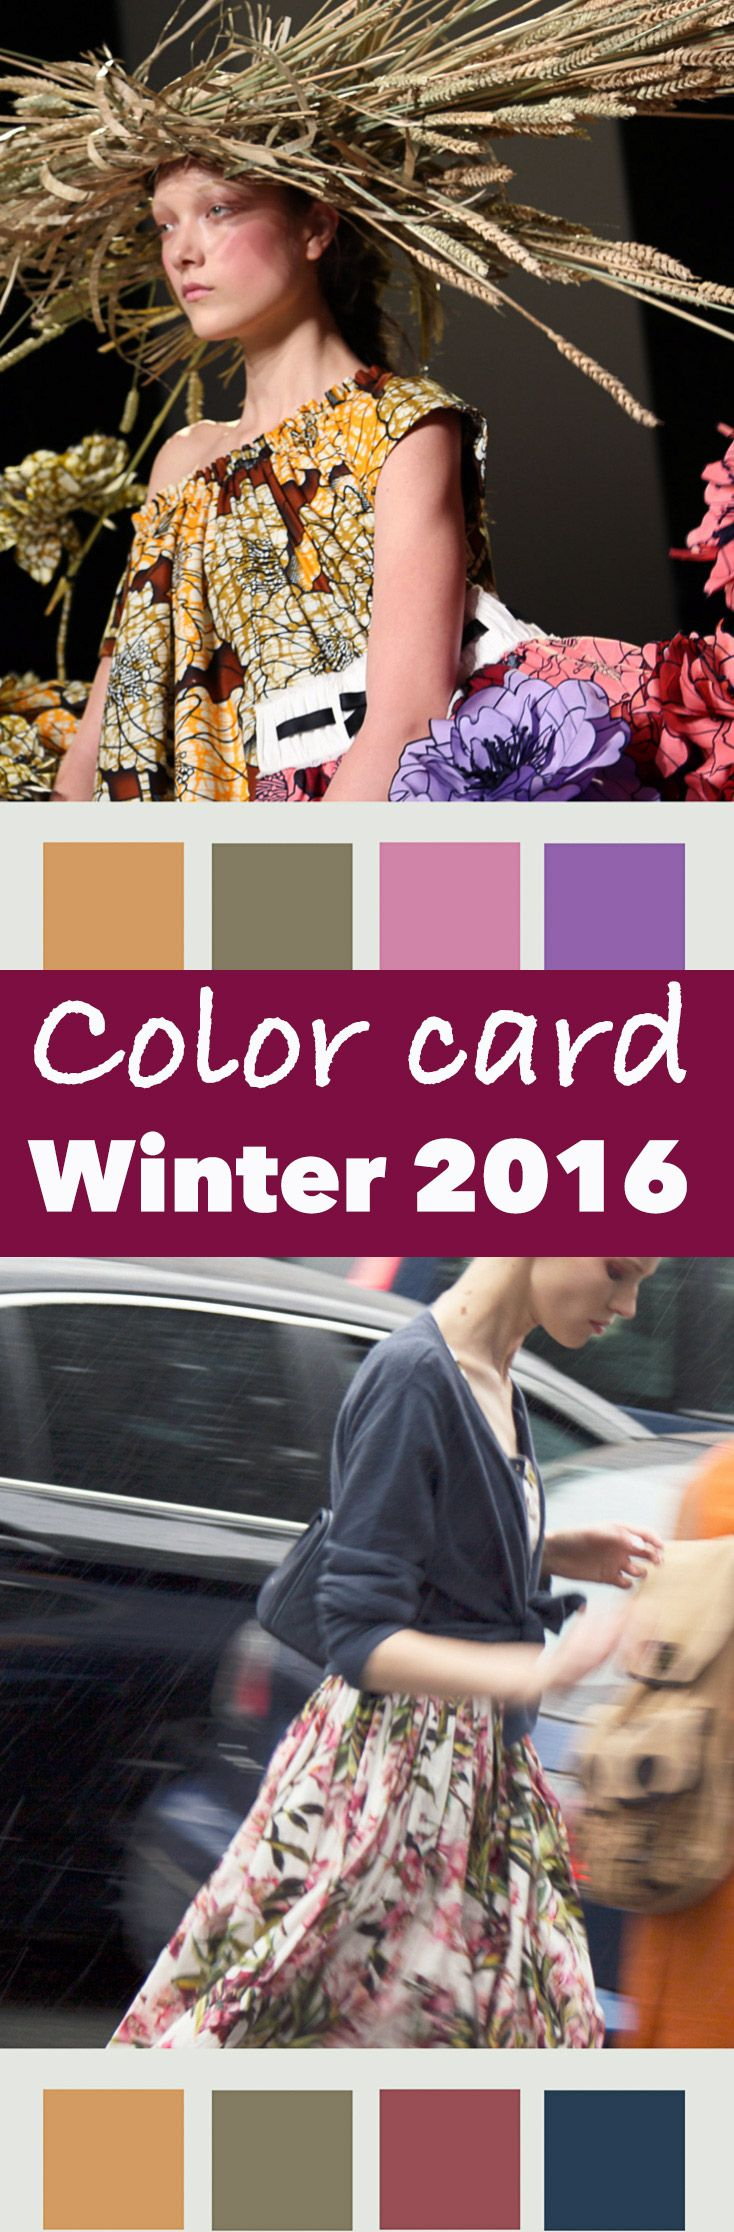 Color-card-fall winter-2016 download direct de grstis colorcard. http://trendbubbles.nl/top-10-modekle…nter-2015-2016/